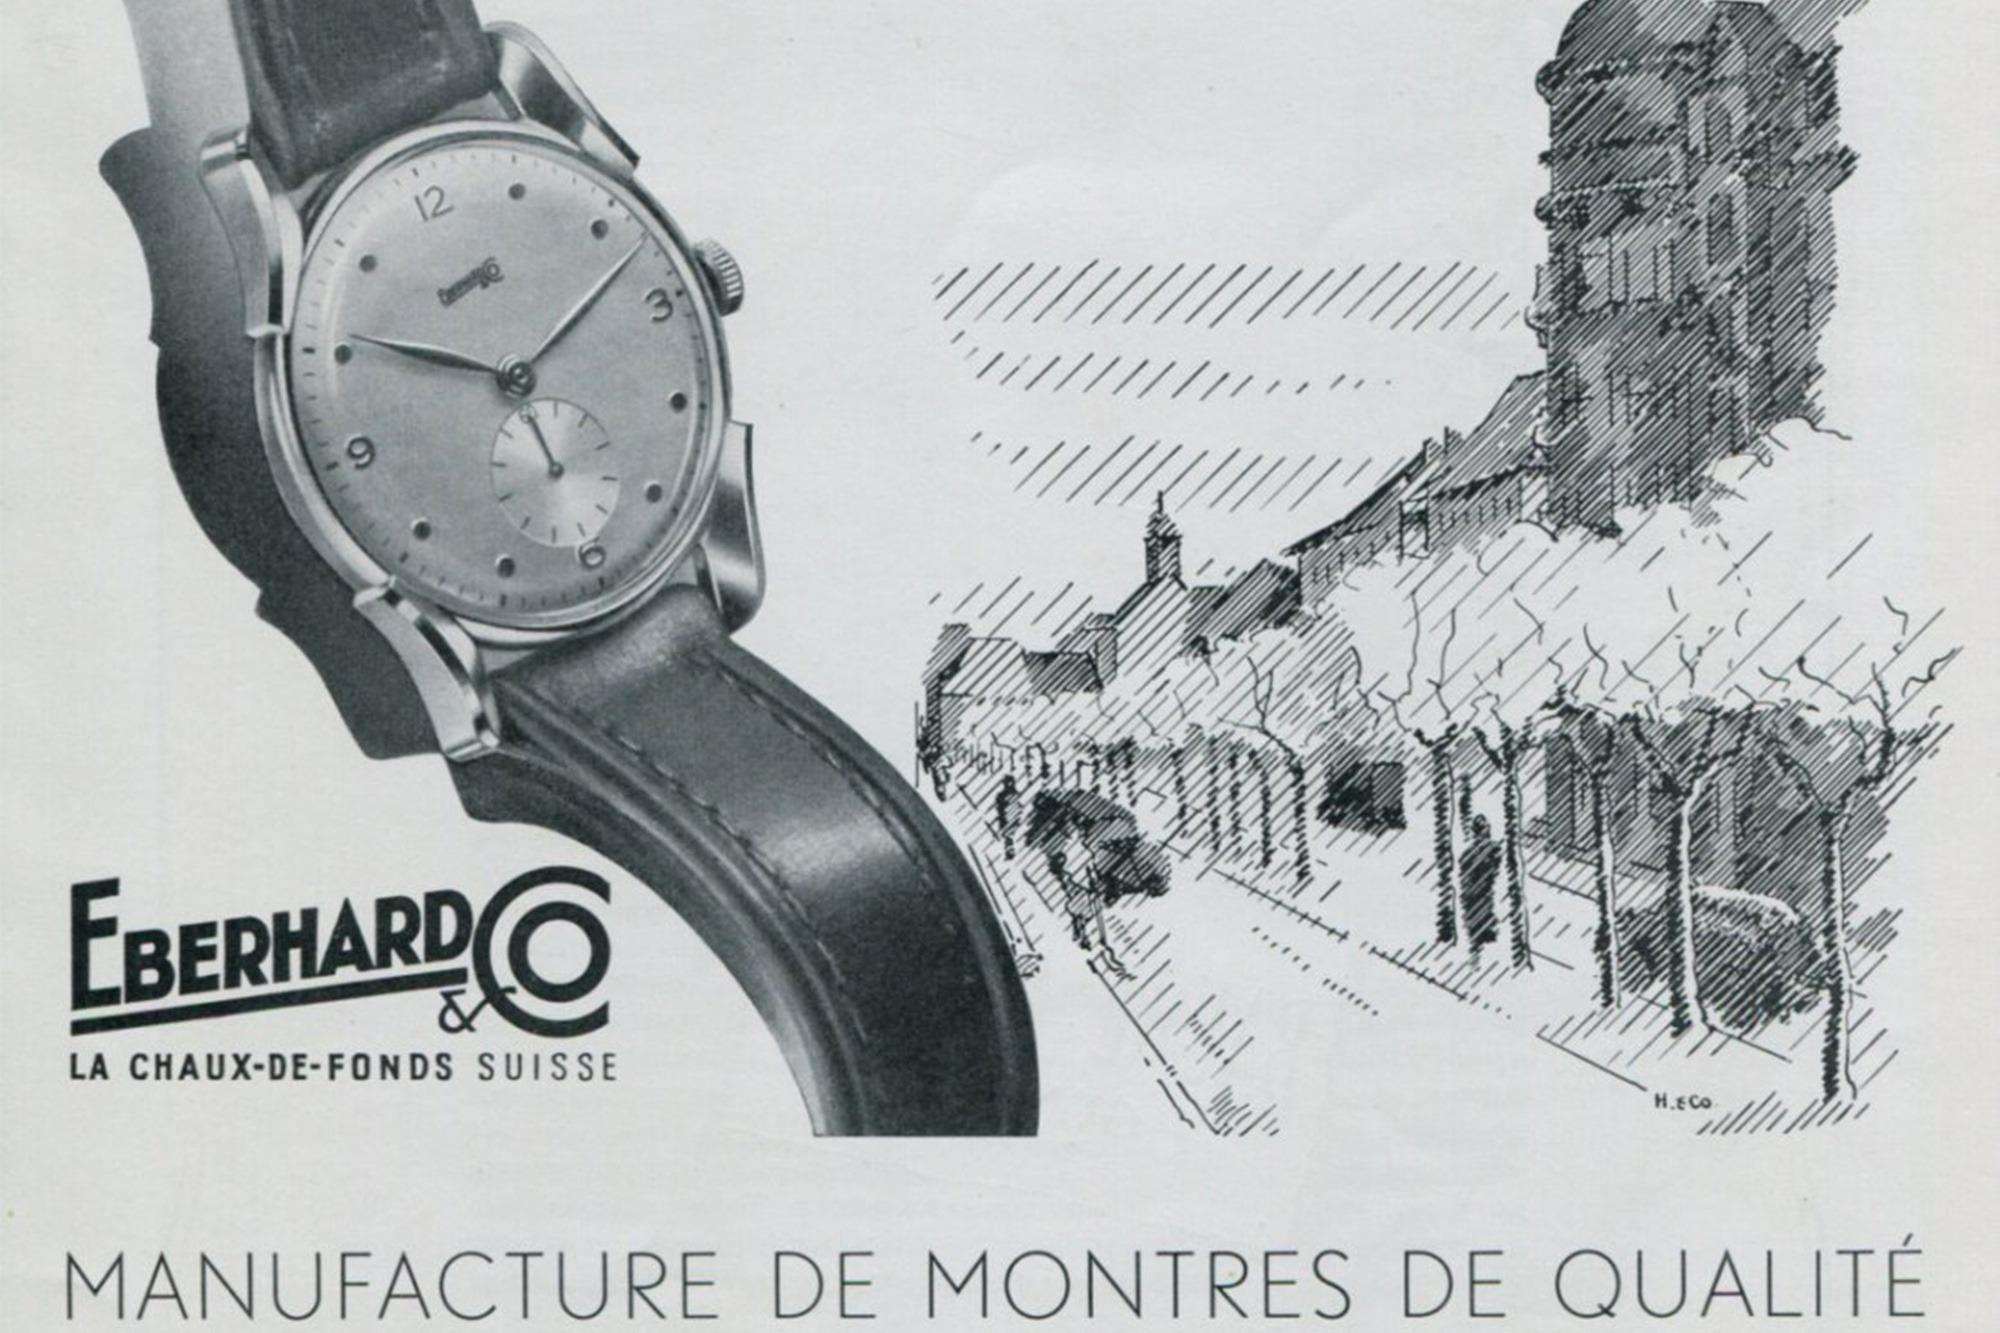 Eberhard & Co Vintage ad